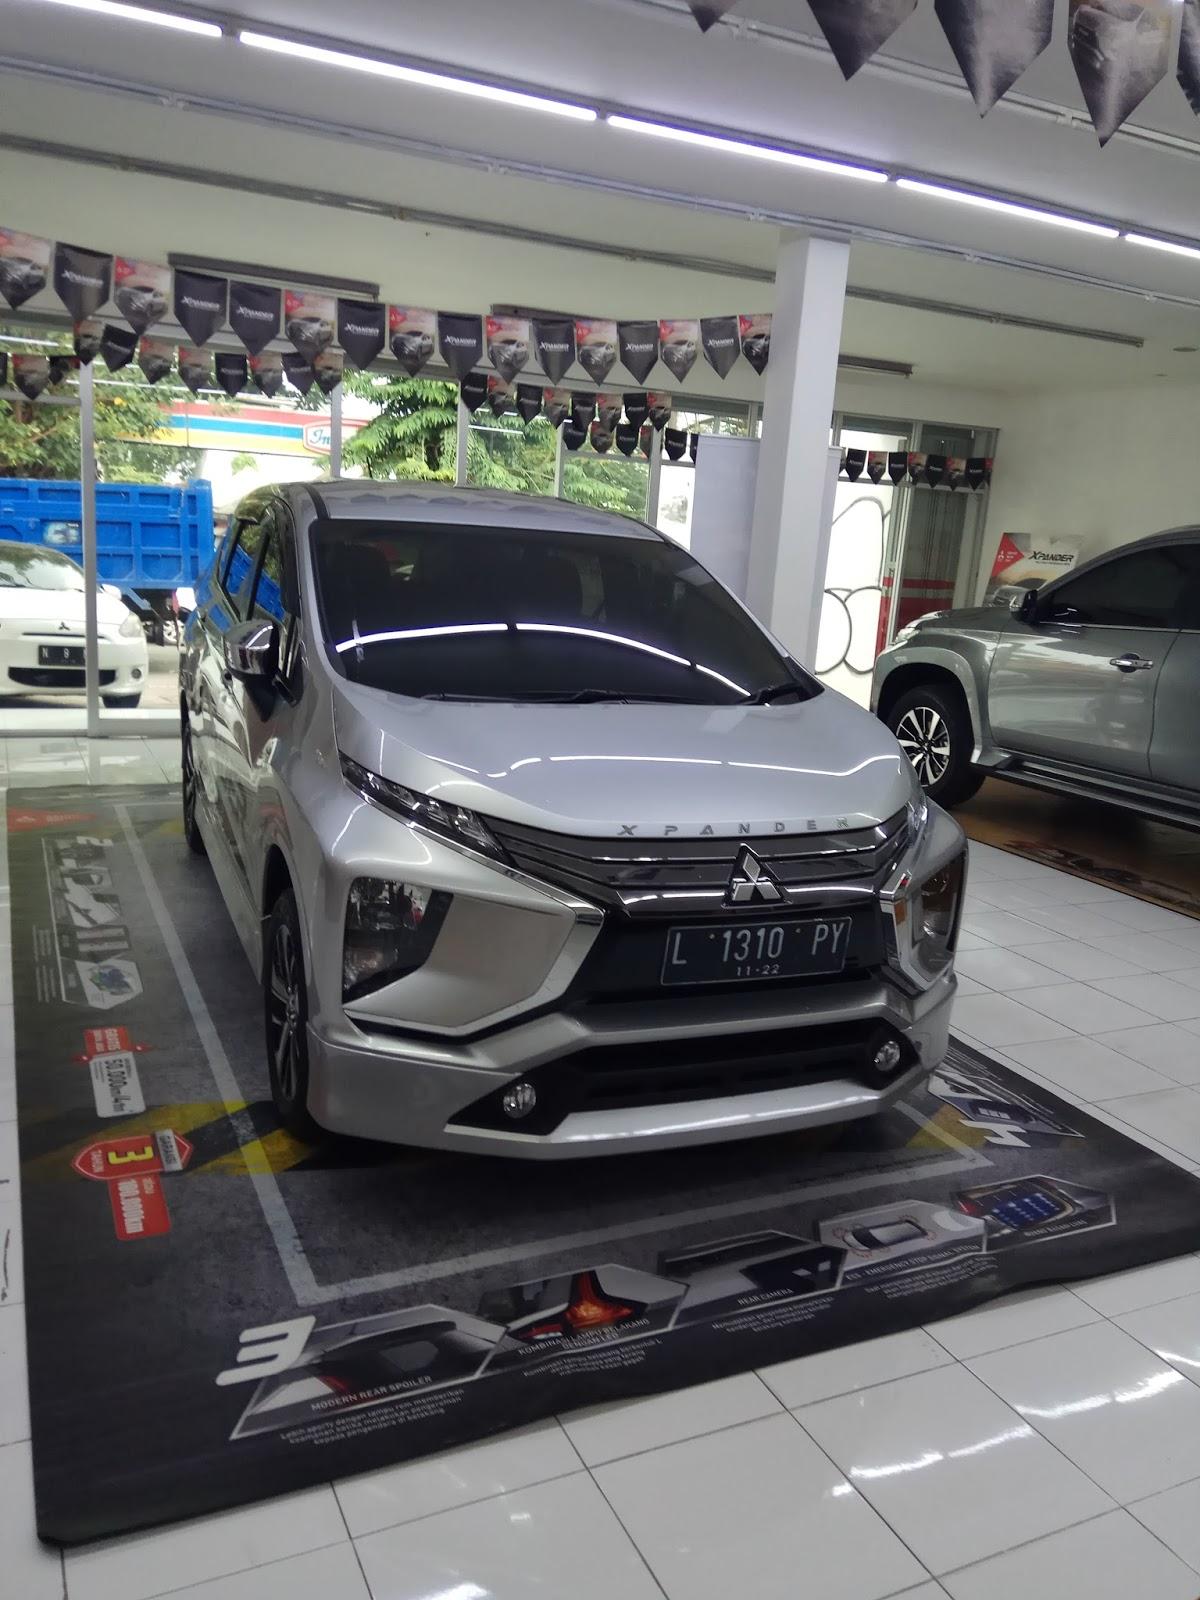 Harga All New Vellfire 2018 Toyota Yaris Trd Vs Honda Jazz Rs Terkuak Price List Mitsubishi Xpander